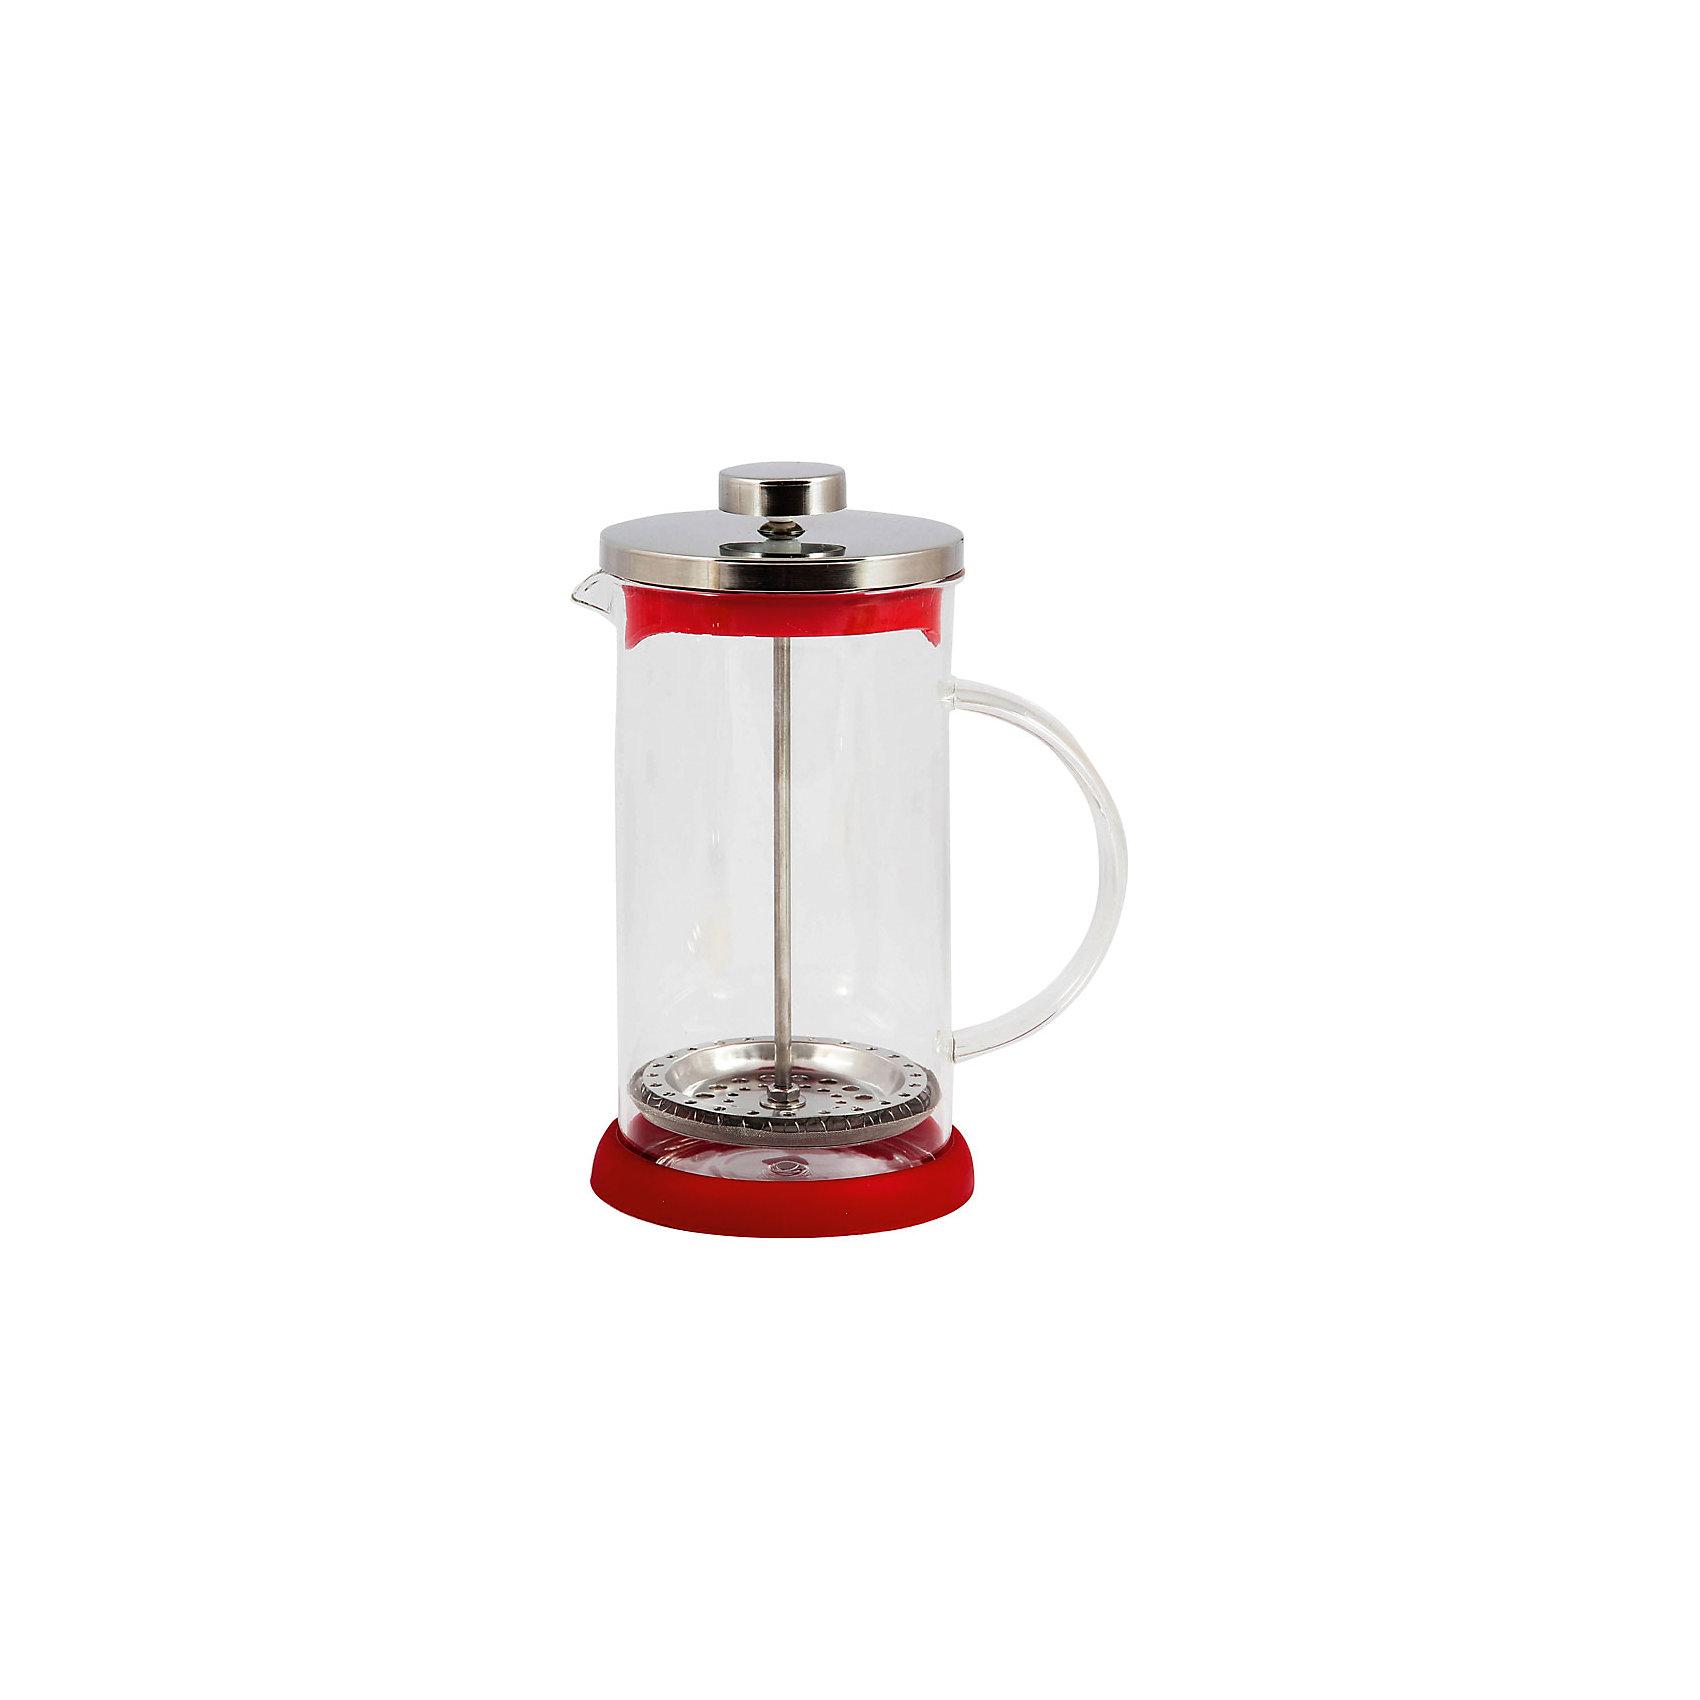 Mallony Кофе-пресс стеклянный GFP01-800ML-R, Mallony, красный